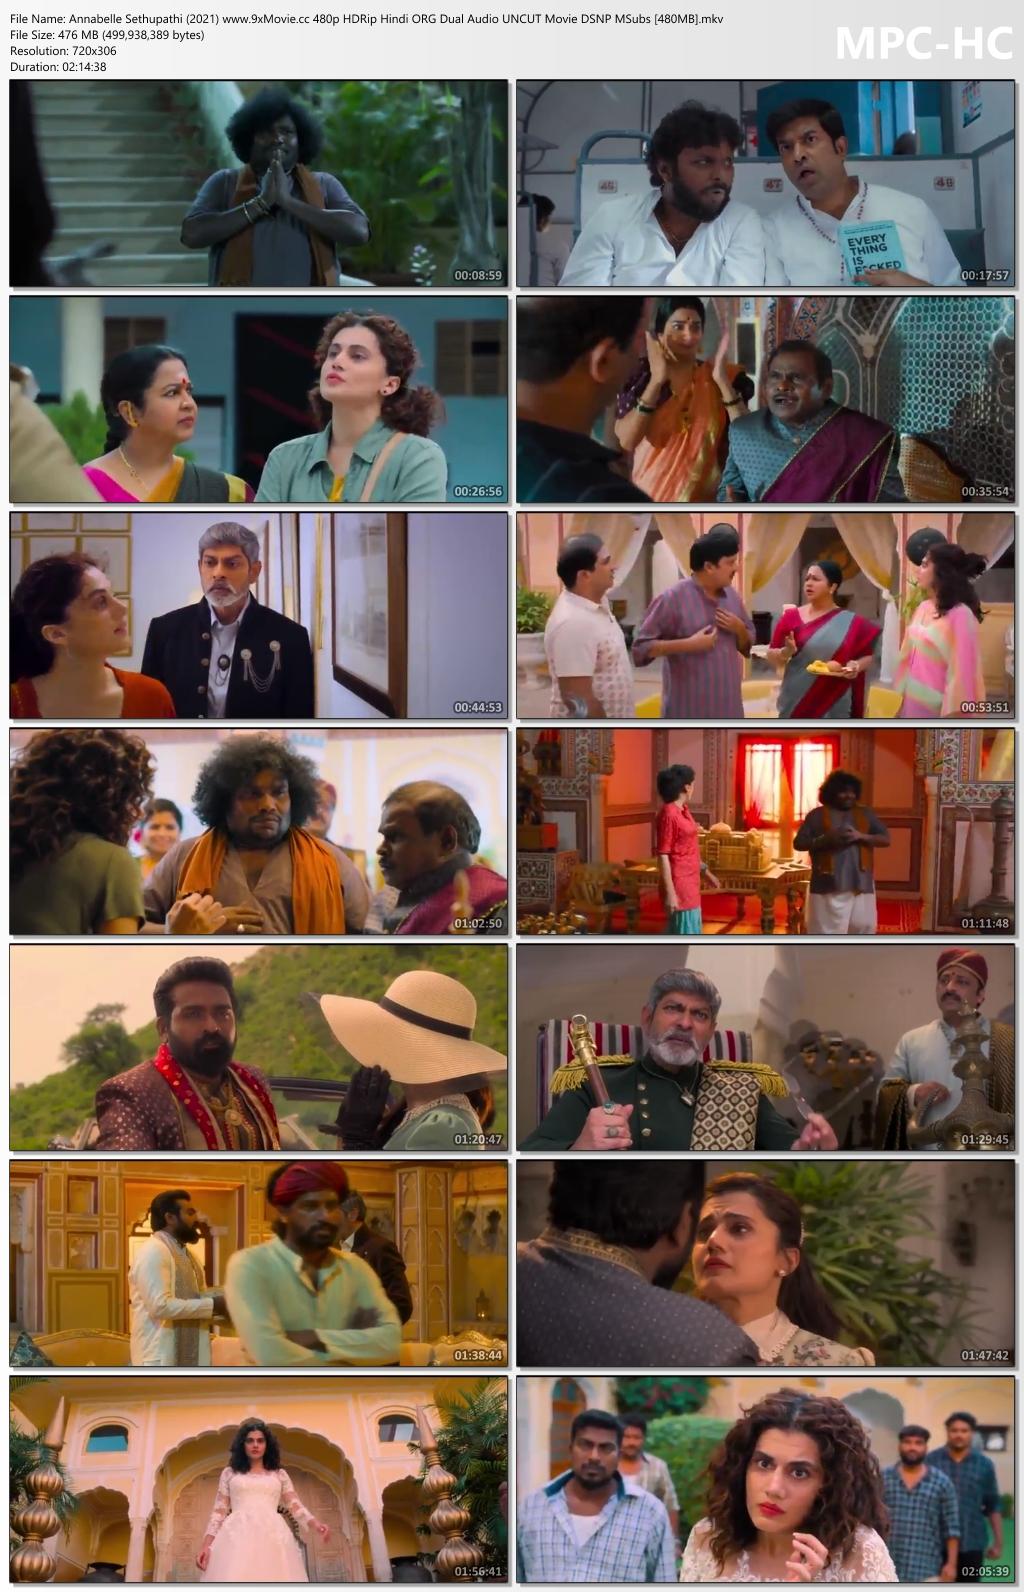 Annabelle-Sethupathi-2021-www-9x-Movie-cc-480p-HDRip-Hindi-ORG-Dual-Audio-UNCUT-Movie-DSNP-MSubs-480